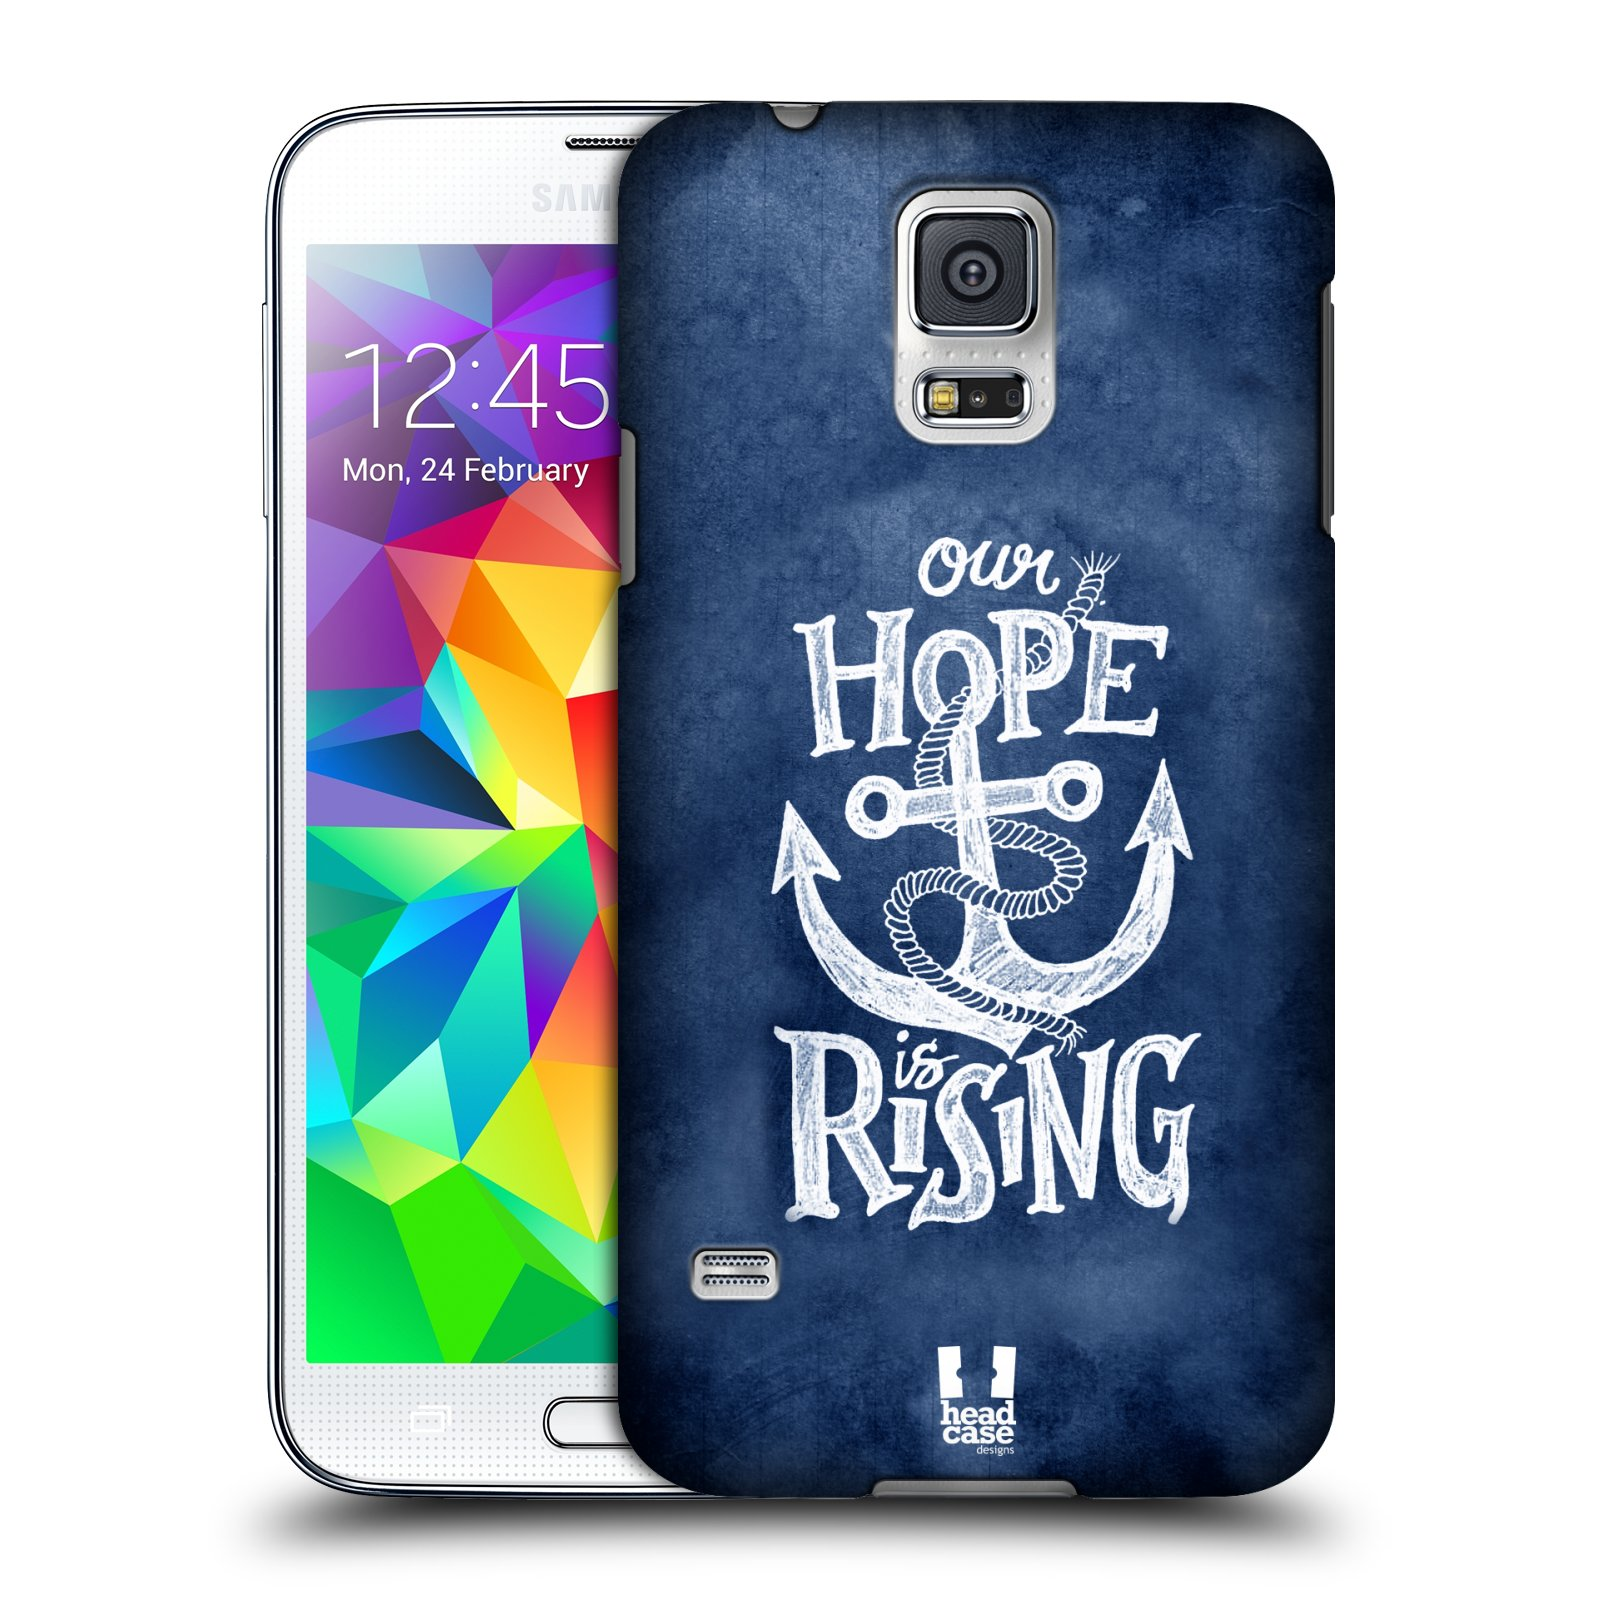 Plastové pouzdro na mobil Samsung Galaxy S5 HEAD CASE KOTVA RISING